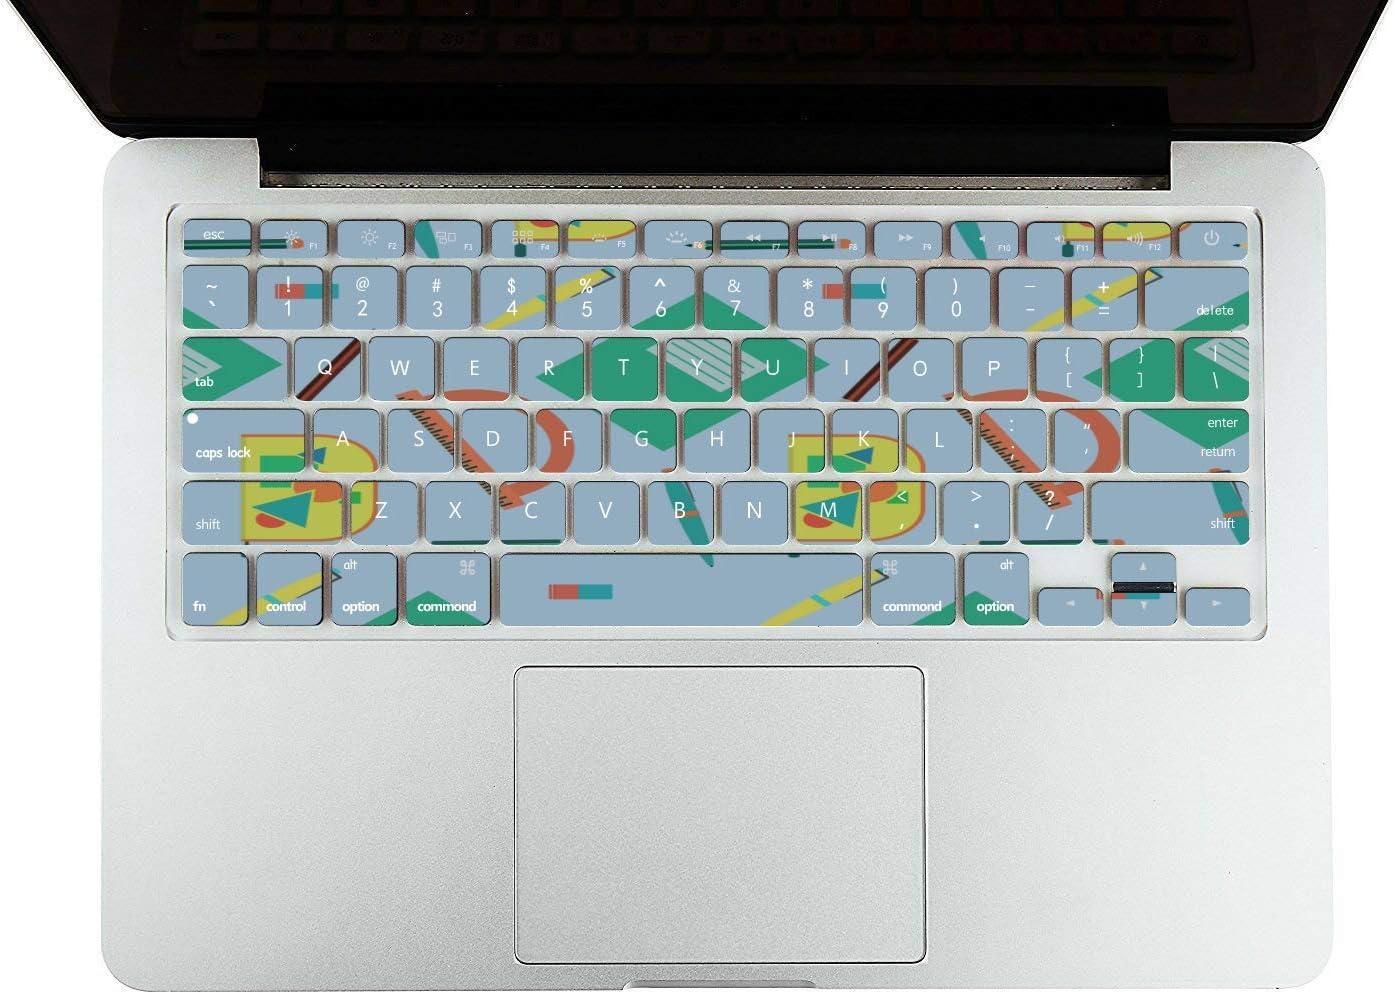 MacBook Air Protective Case School Supplies Pencil Sharpener Plastic Hard Shell Compatible Mac Air 11 Pro 13 15 MacBook Accessories Protection for MacBook 2016-2019 Version